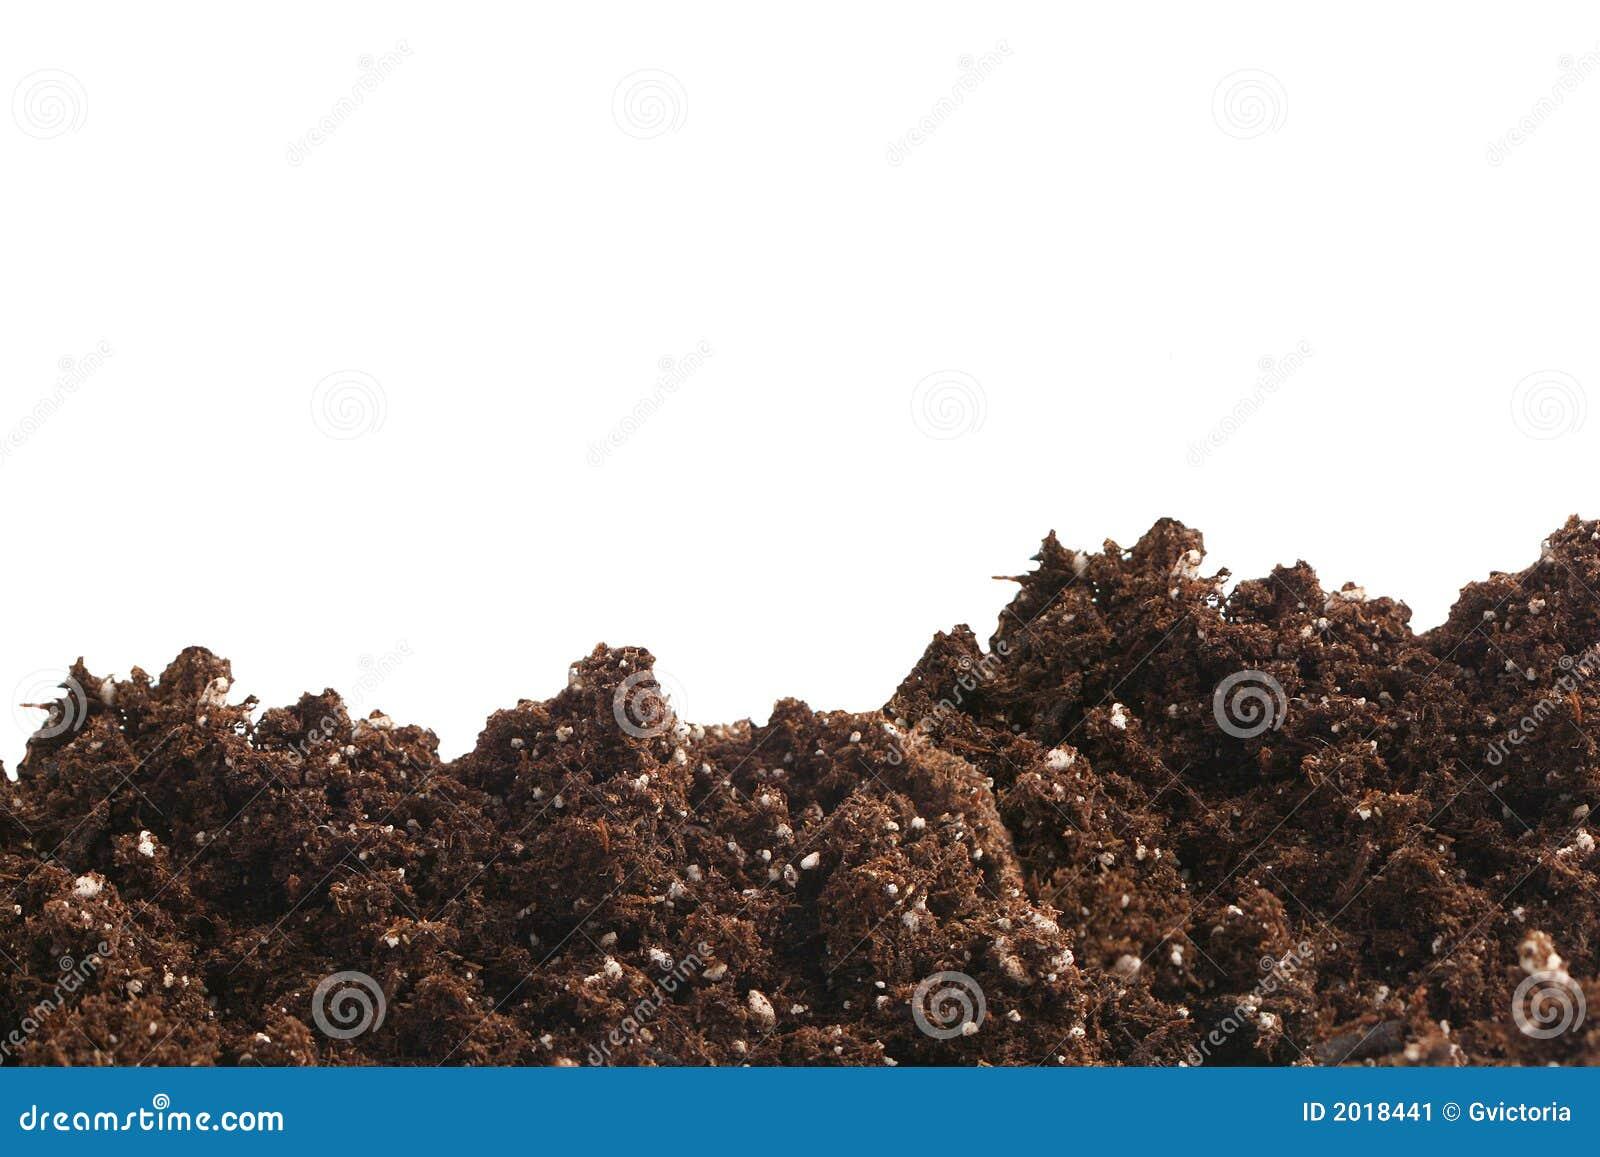 Garden Dirt Stock Image Image 2018441